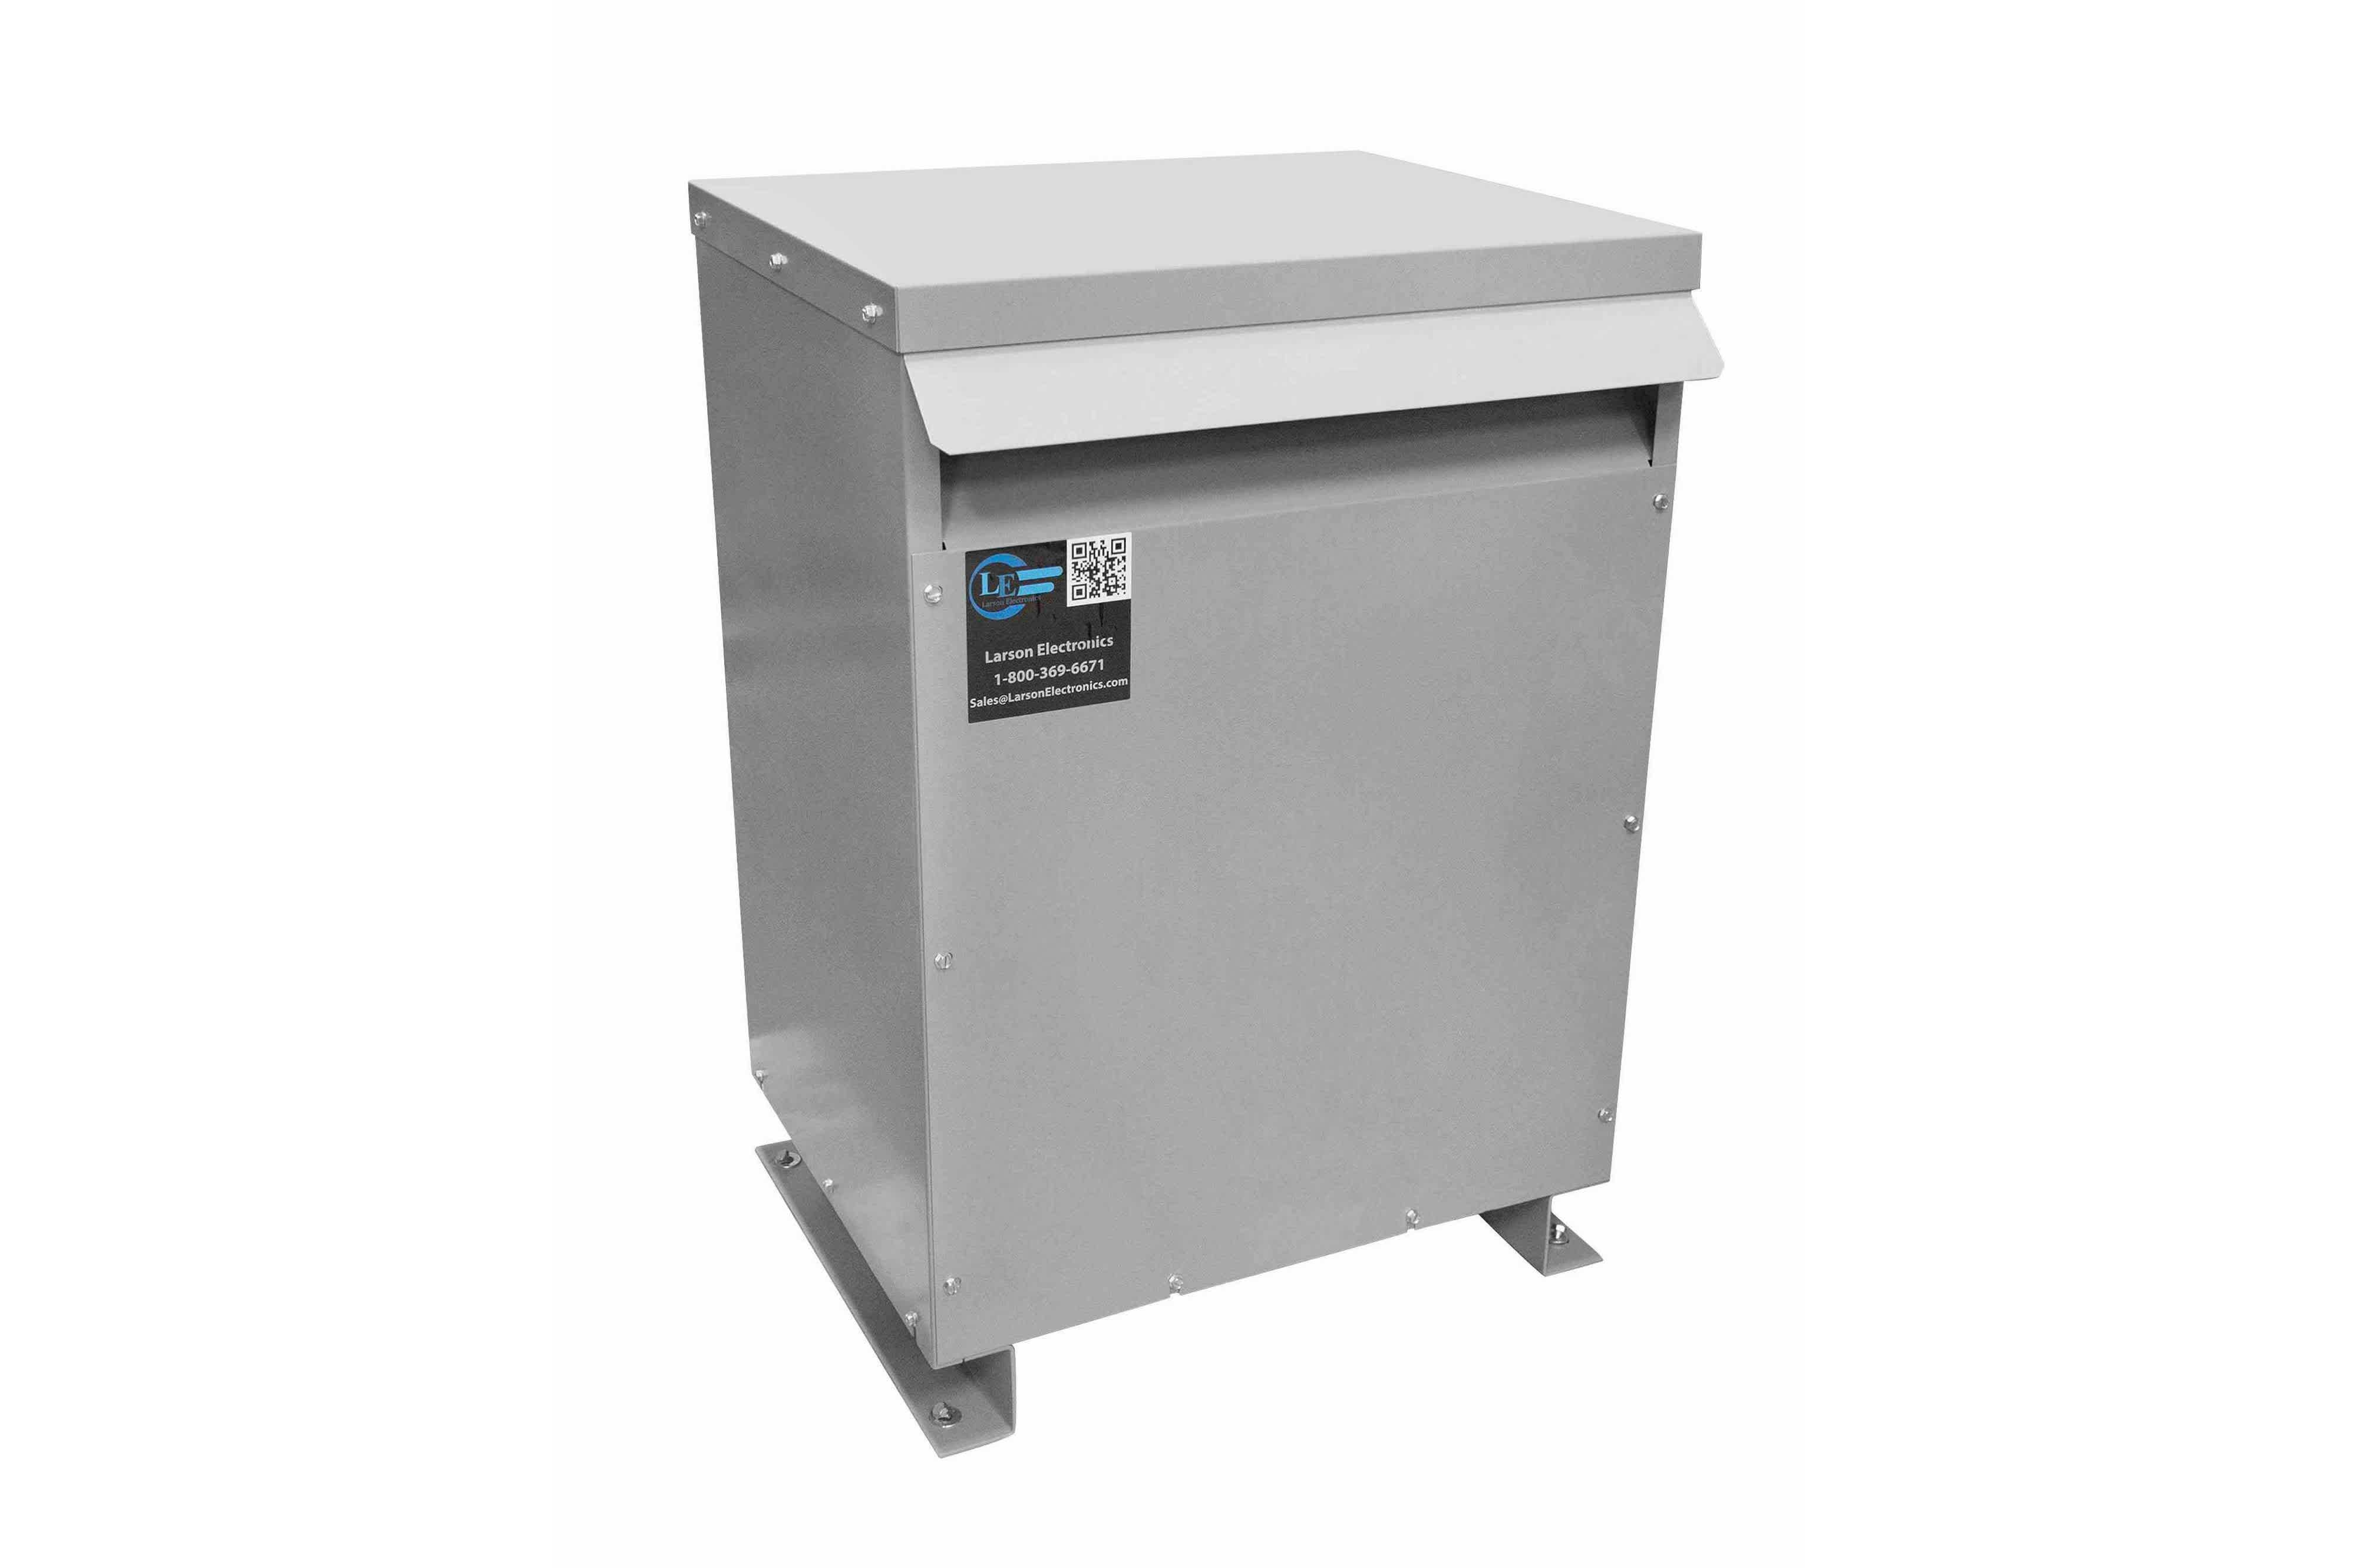 18 kVA 3PH Isolation Transformer, 208V Wye Primary, 600Y/347 Wye-N Secondary, N3R, Ventilated, 60 Hz